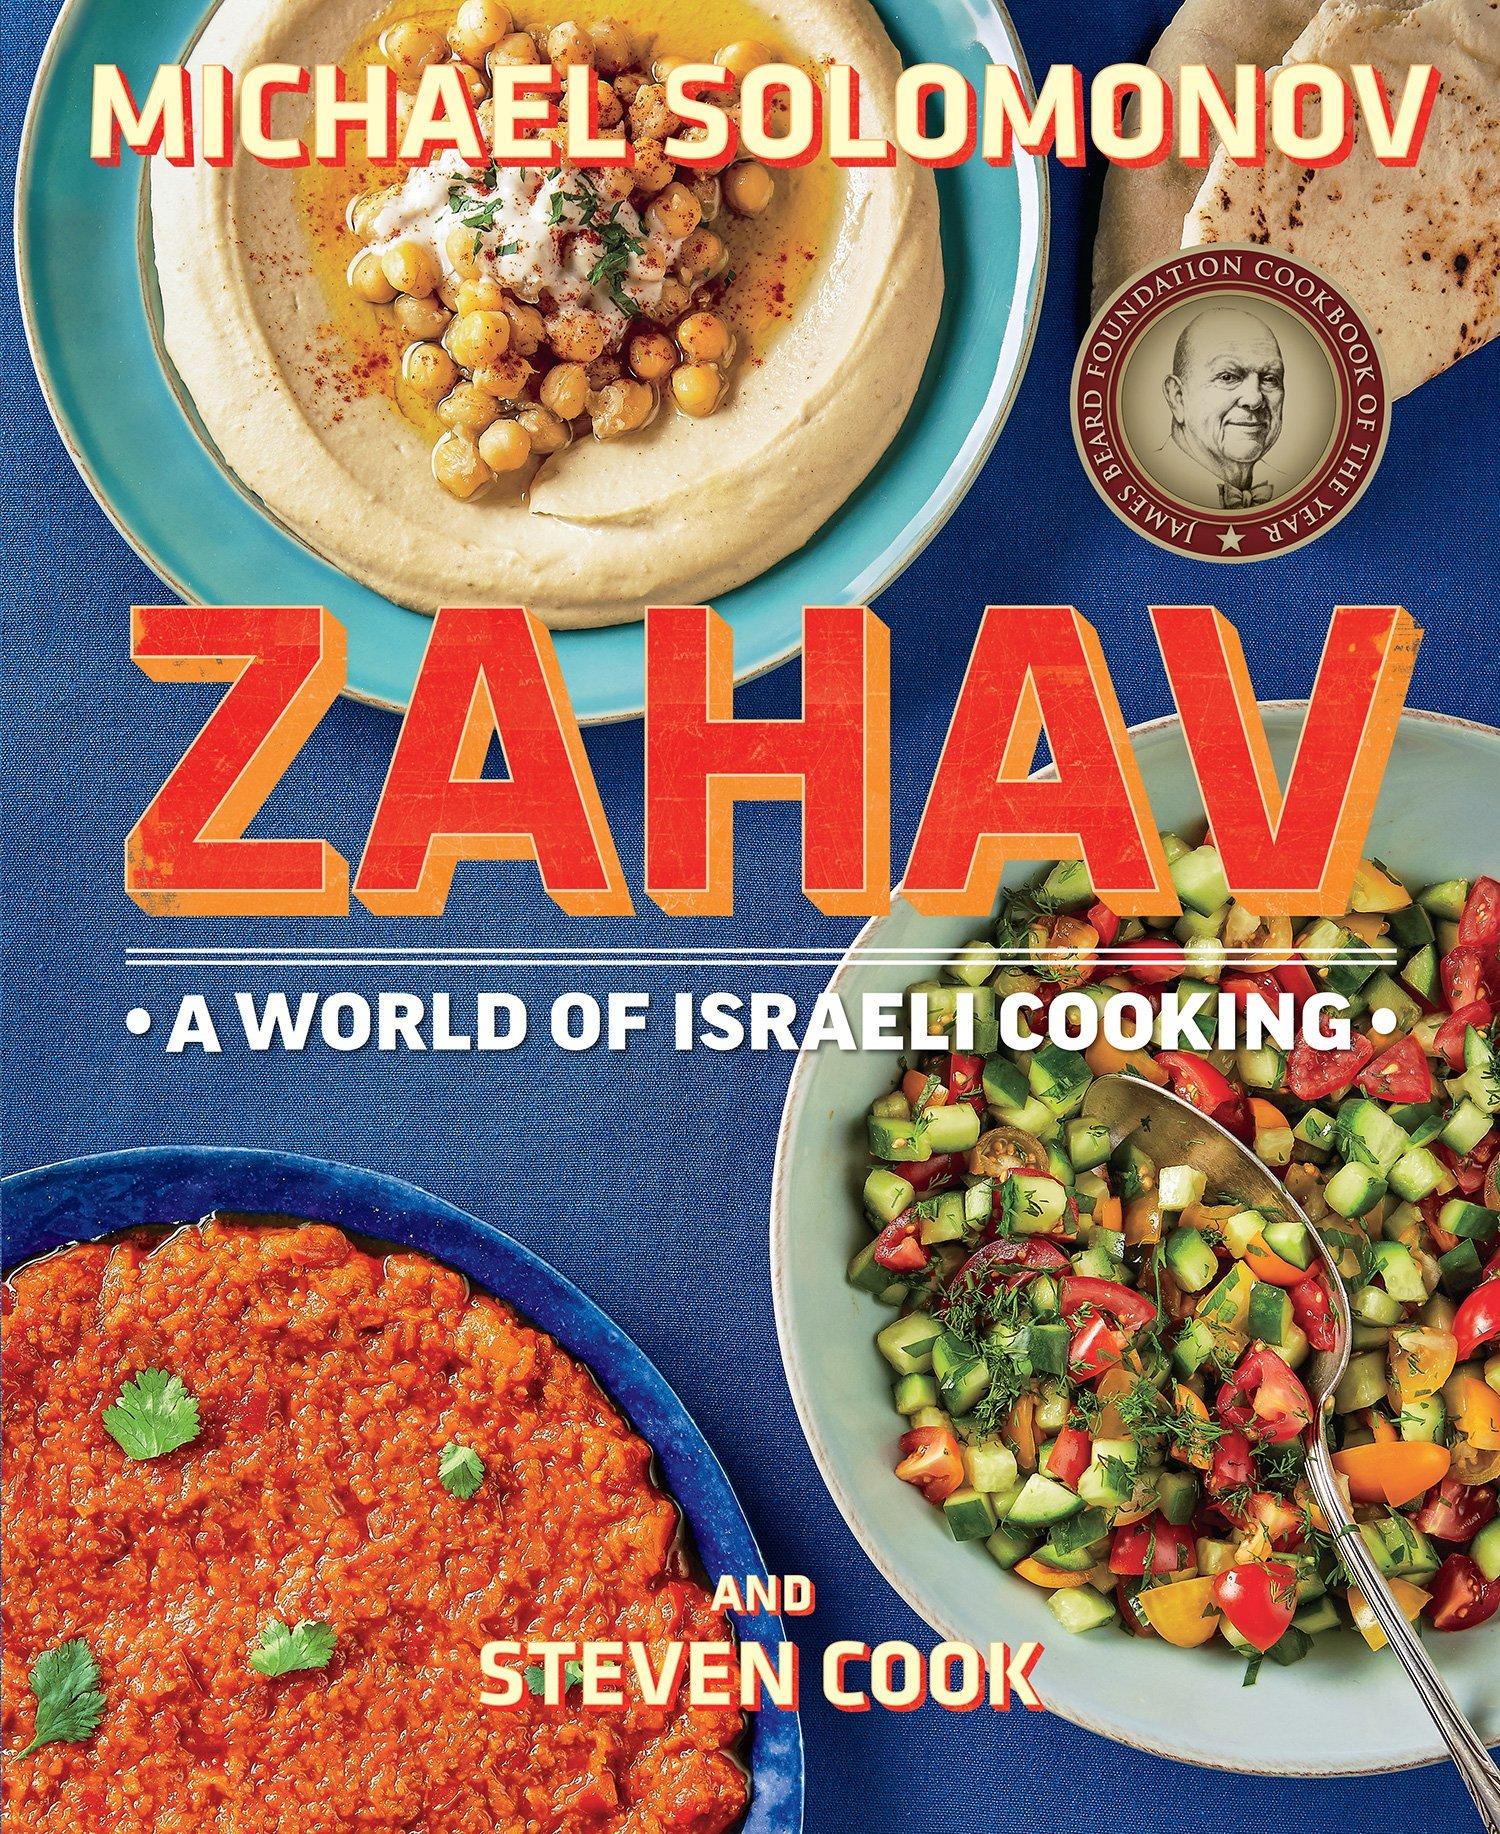 March, 2018: Zahav (Rux Martin/Houghton Mifflin Harcourt)